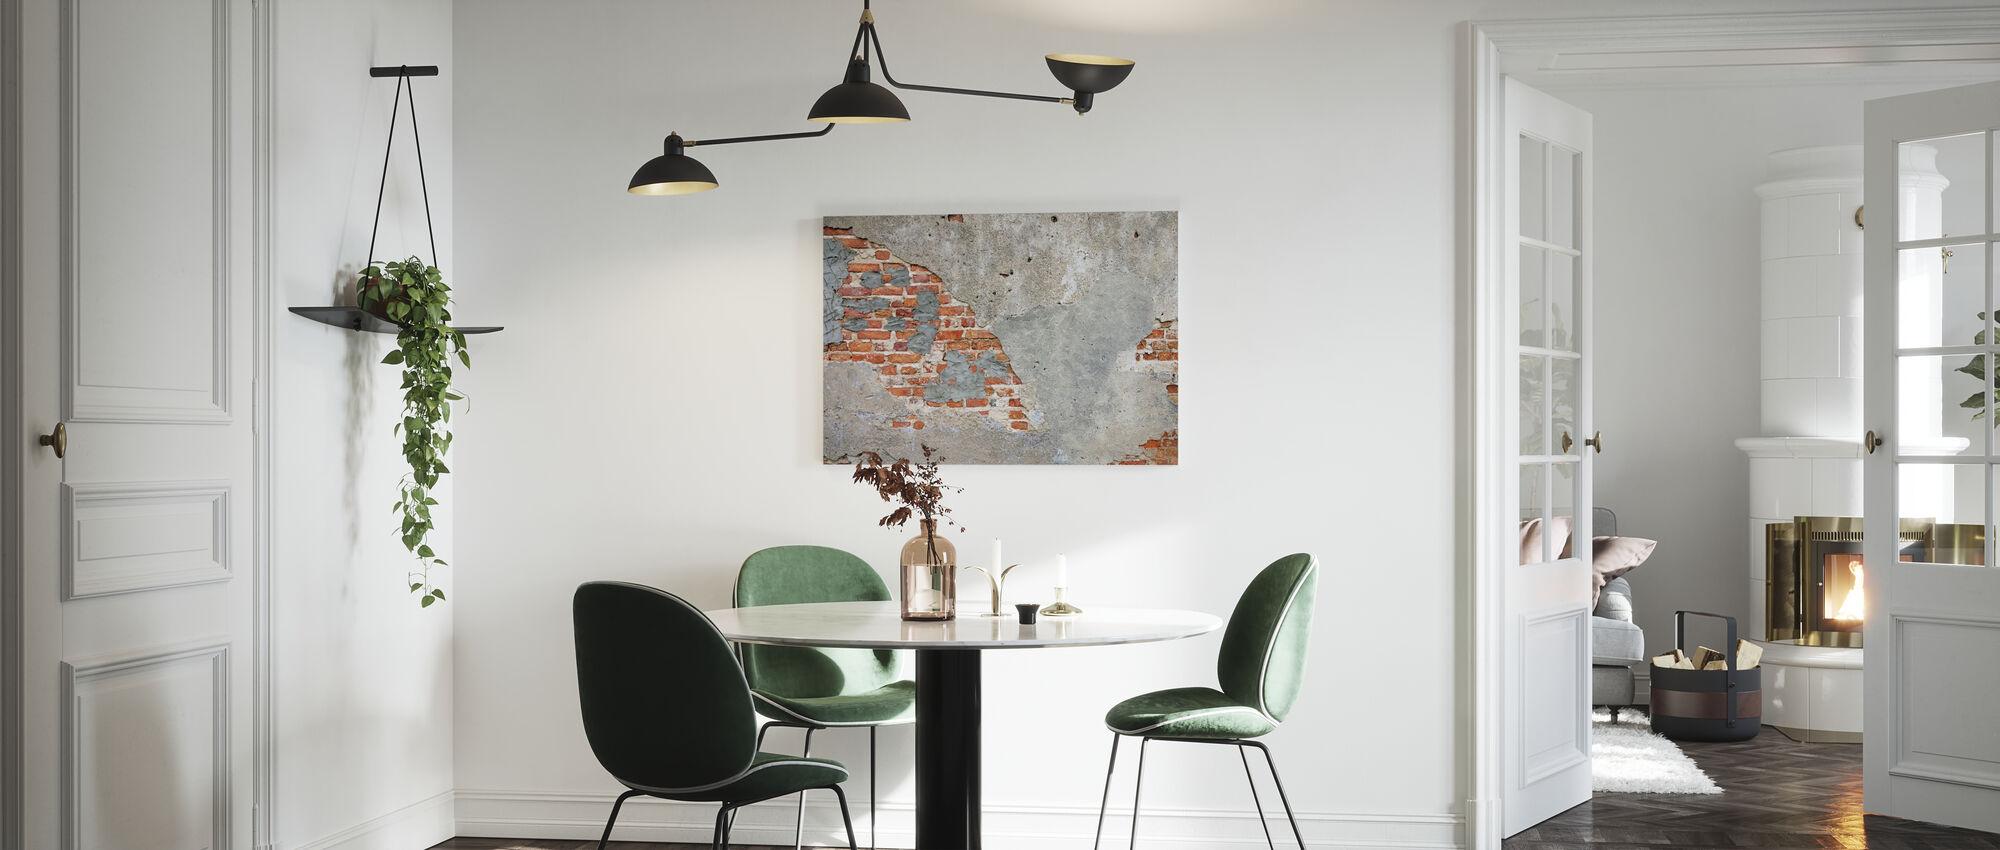 Brick Wall - Canvas print - Kitchen